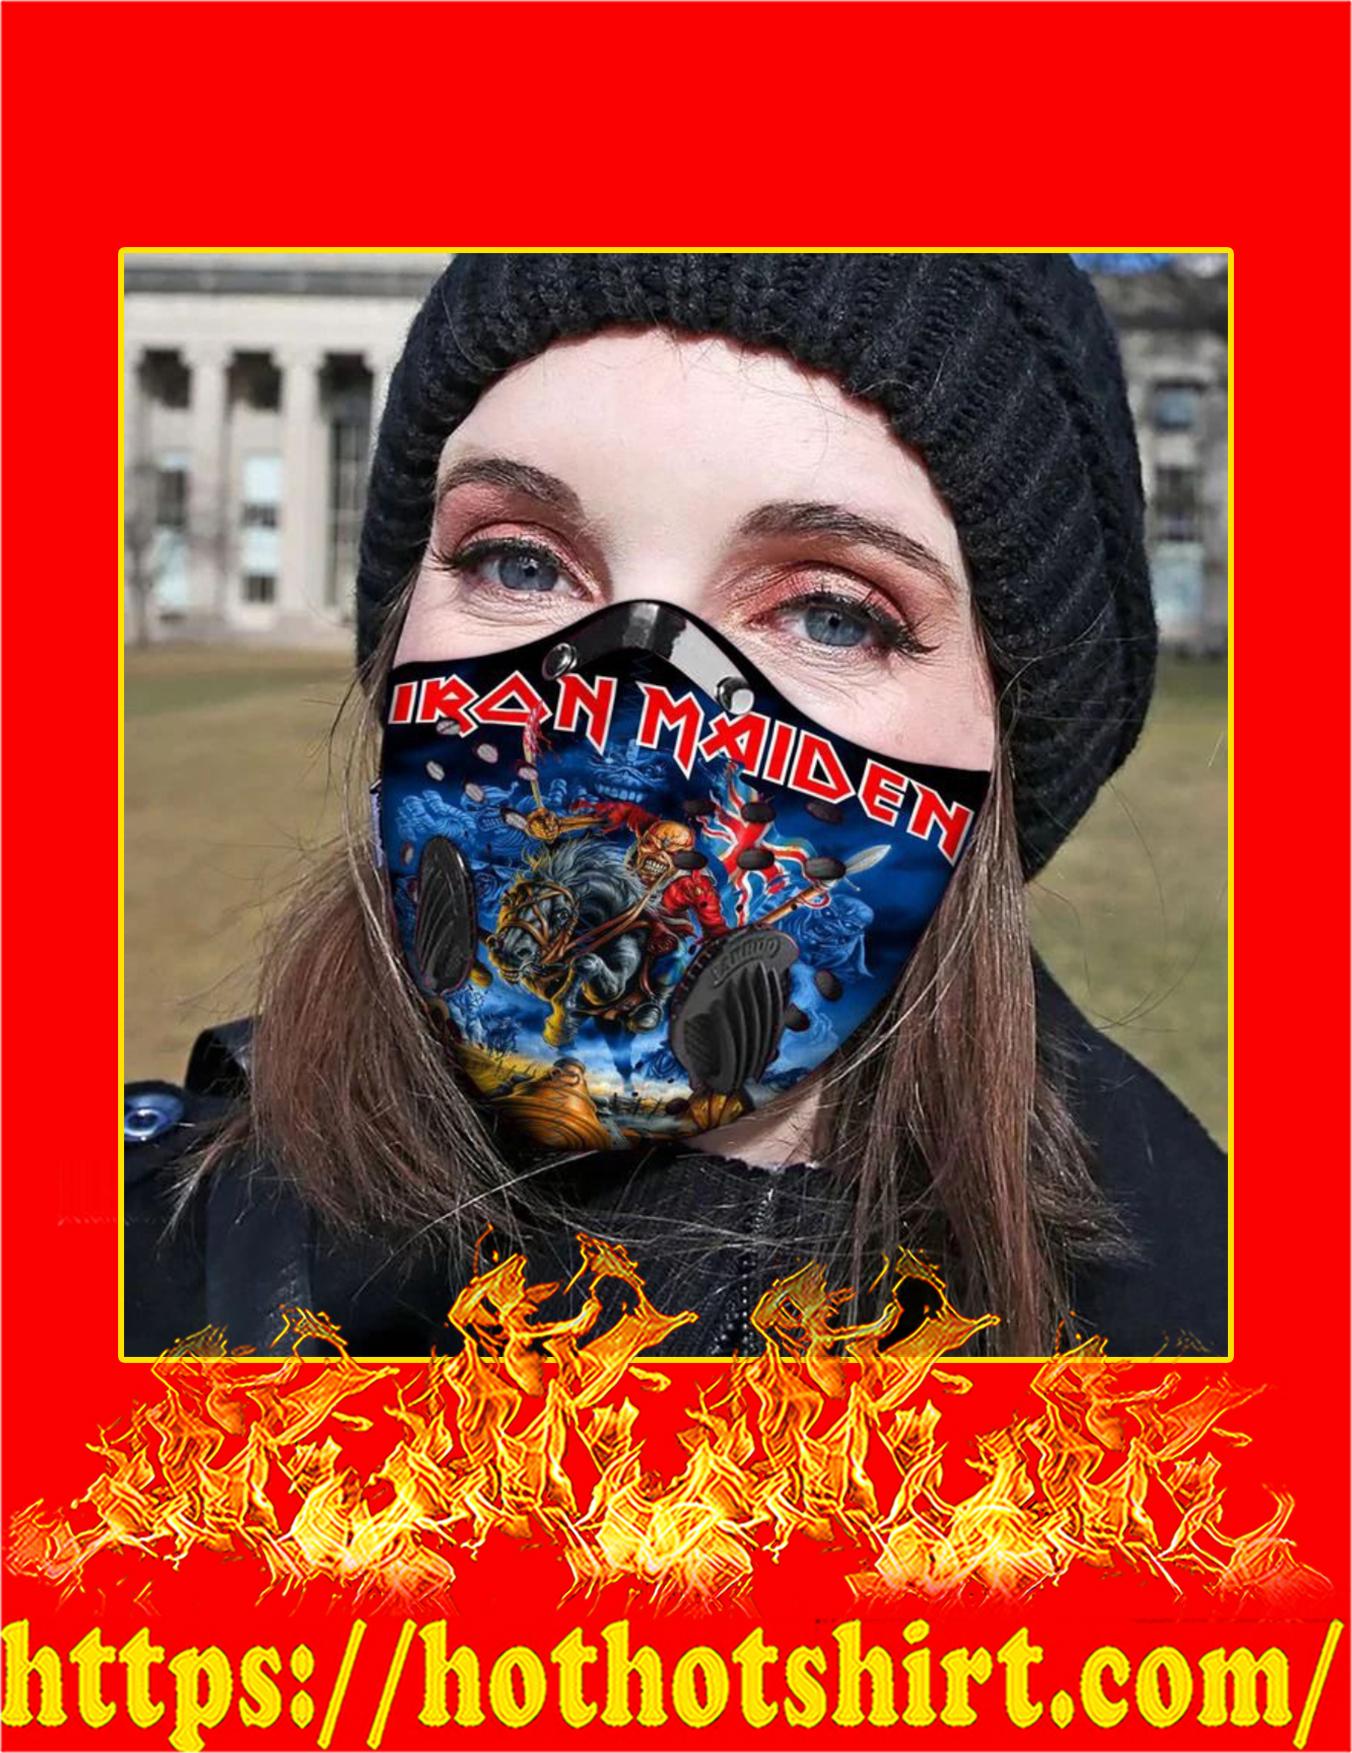 Iron maiden filter face mask